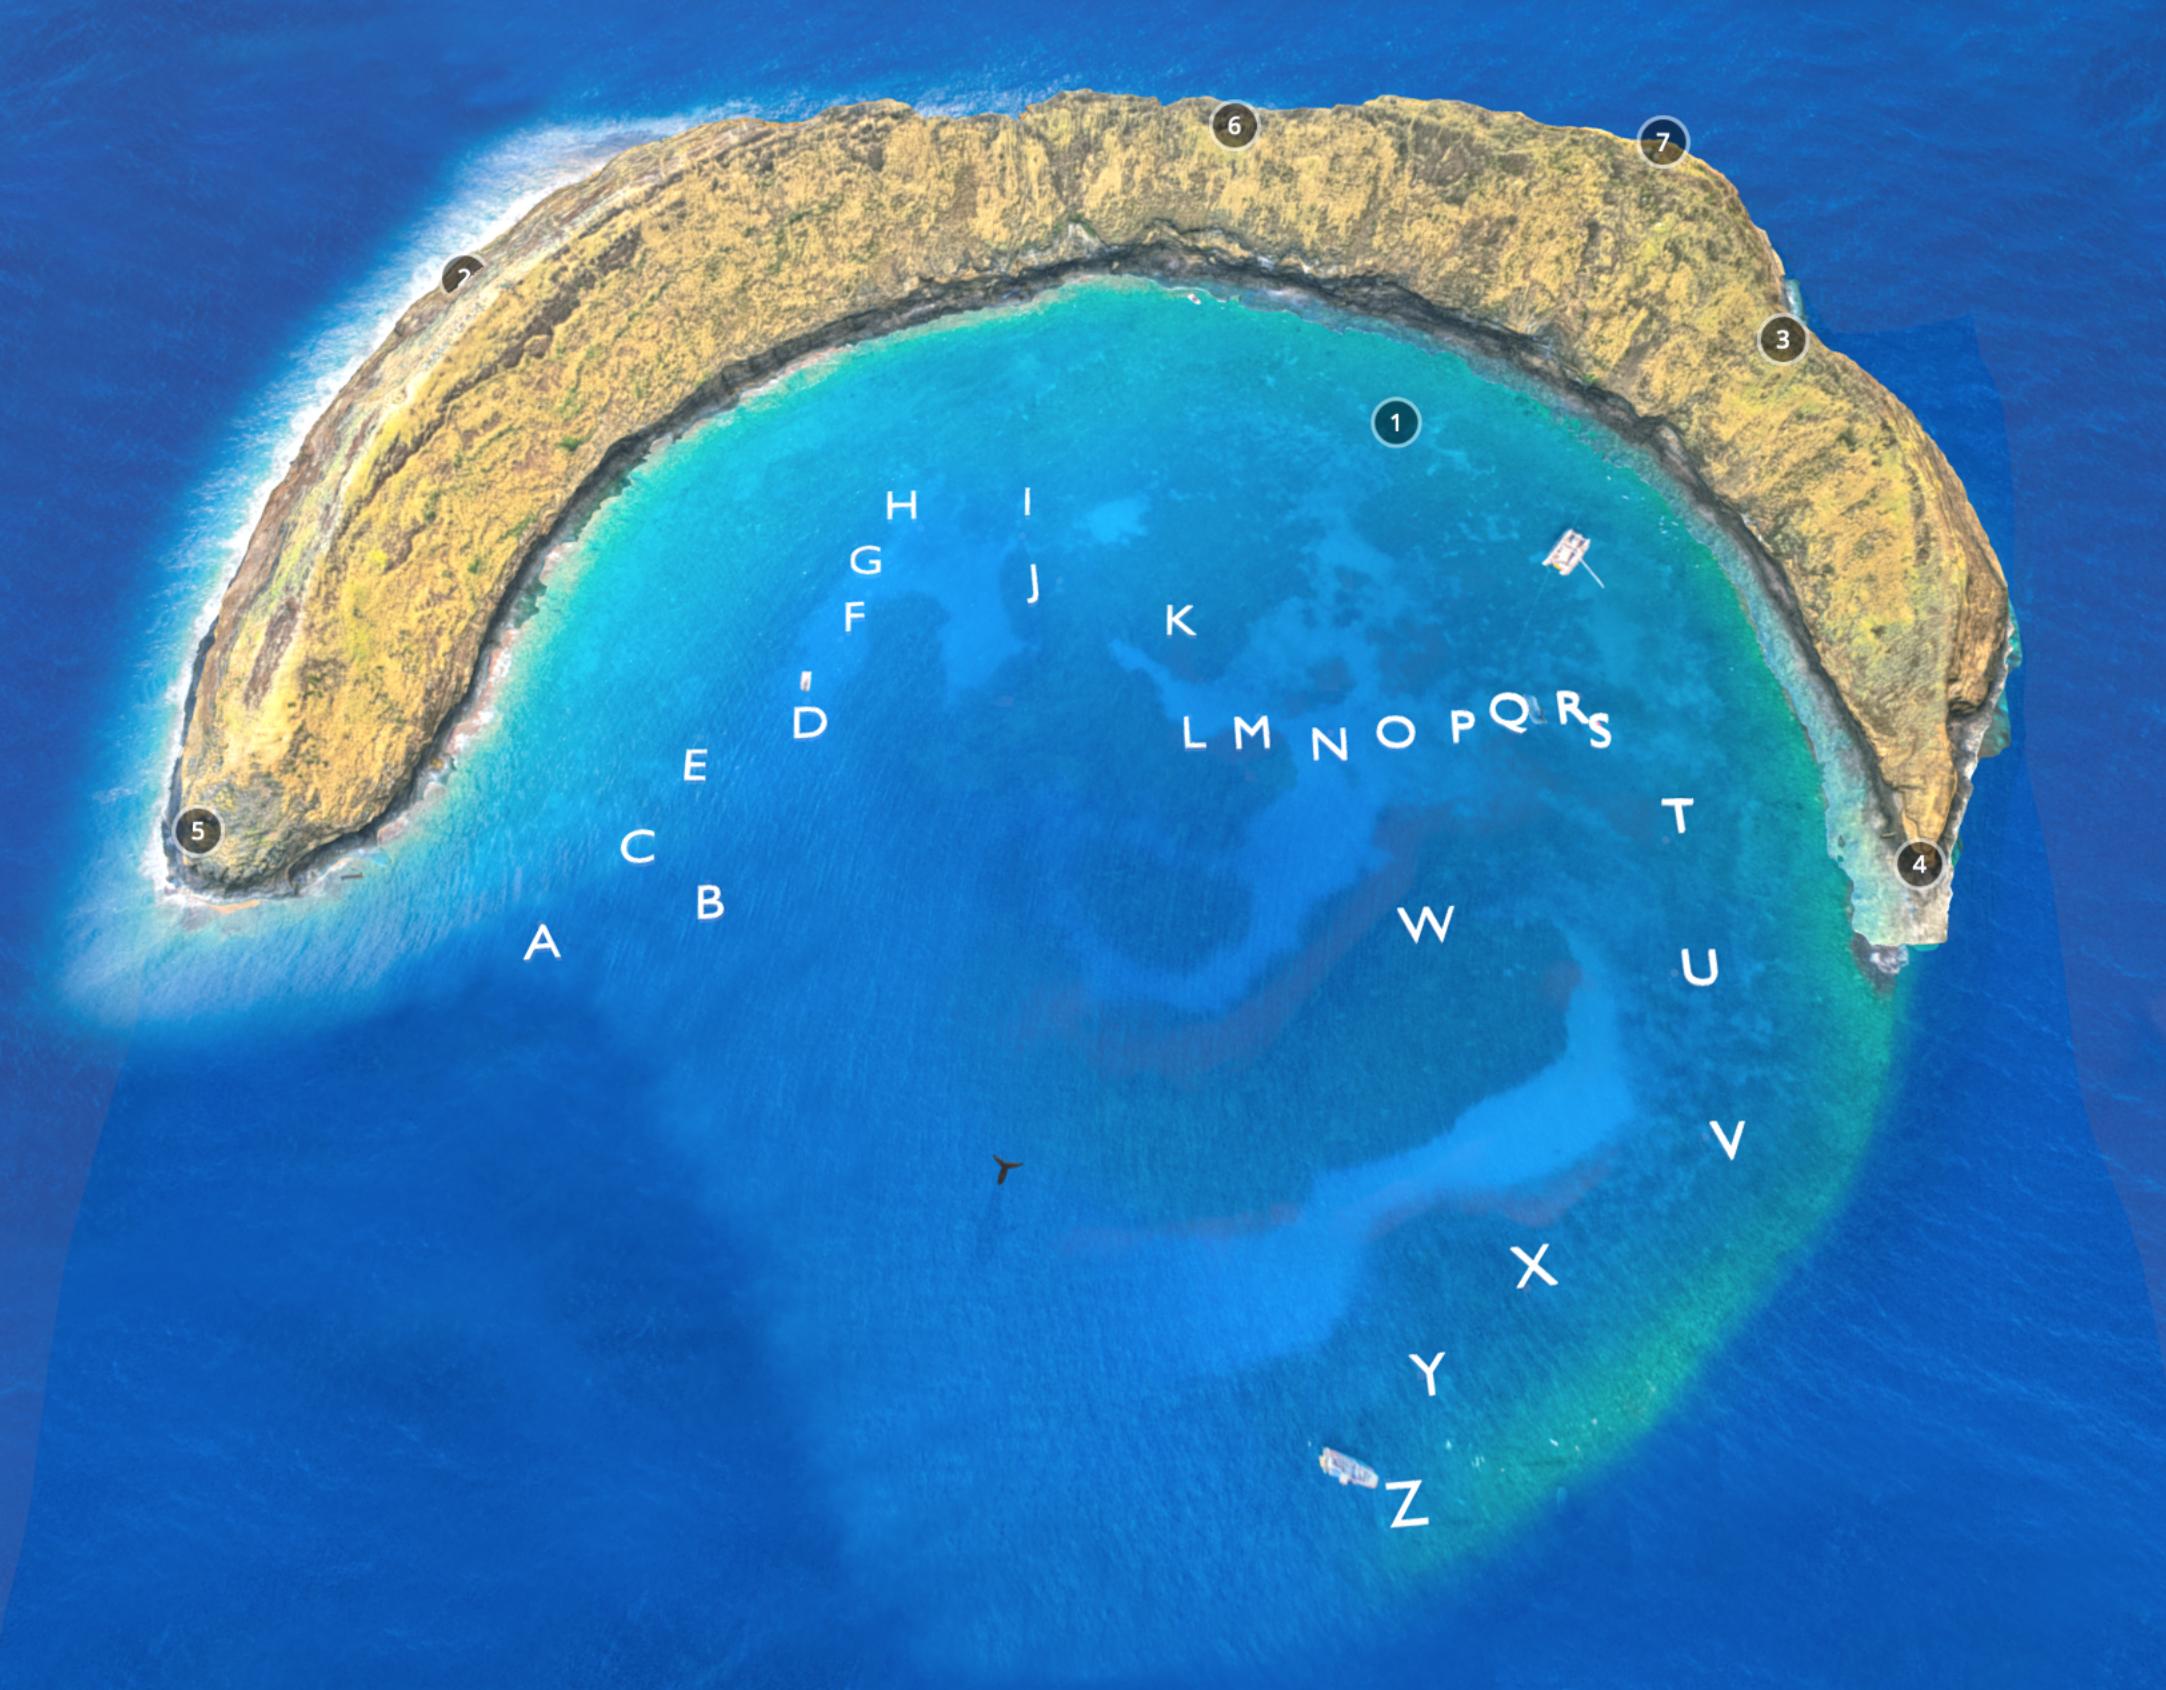 Molokini_island_photogrammetry_scan.png